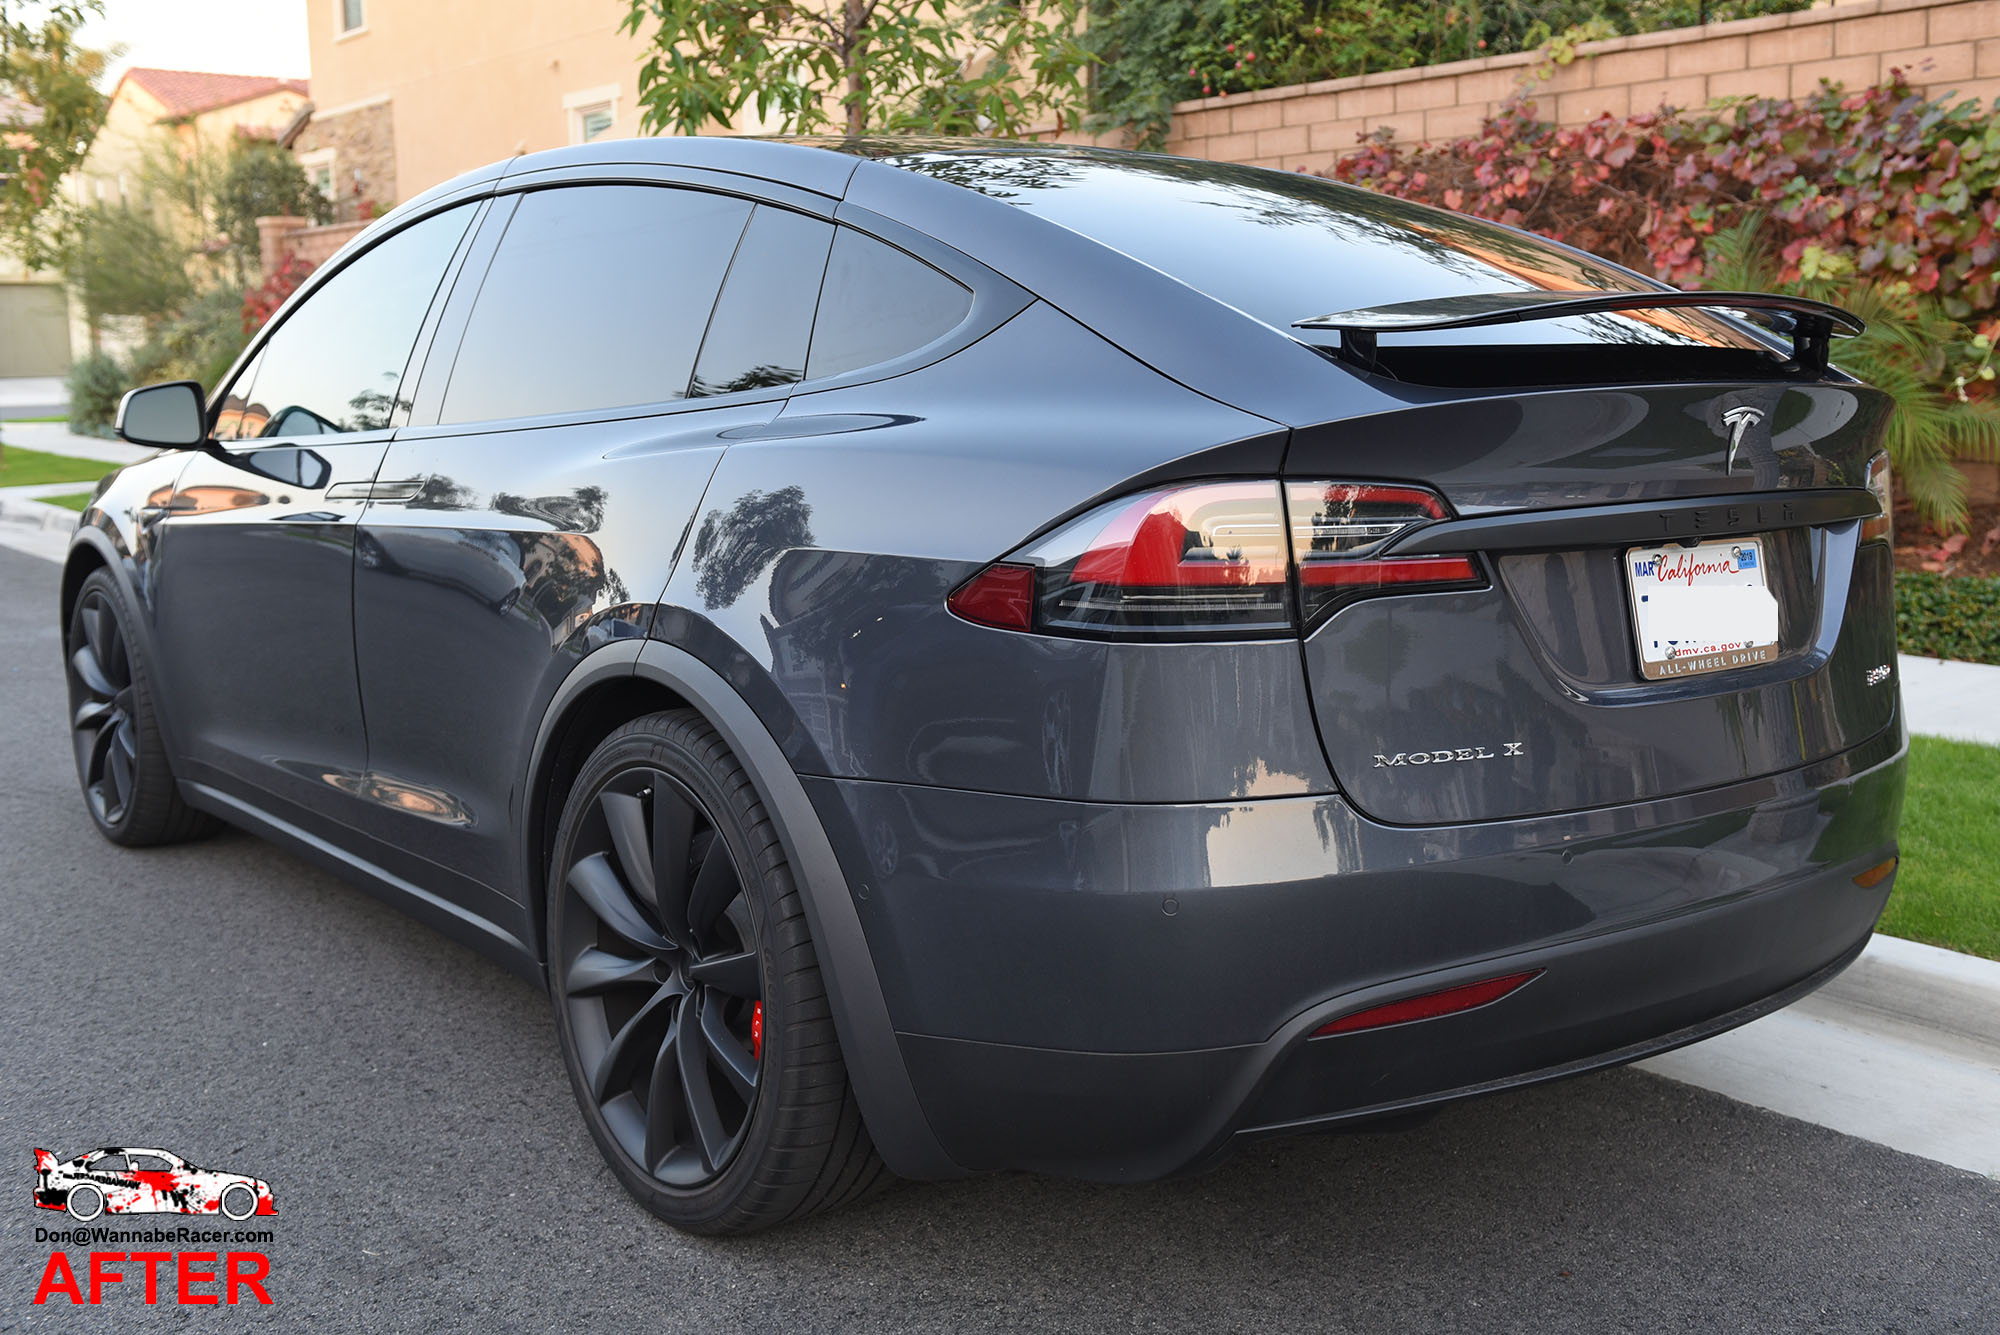 Tesla Model X SUV - Gloss Black Chrome Delete Package Vinyl Car Wrap